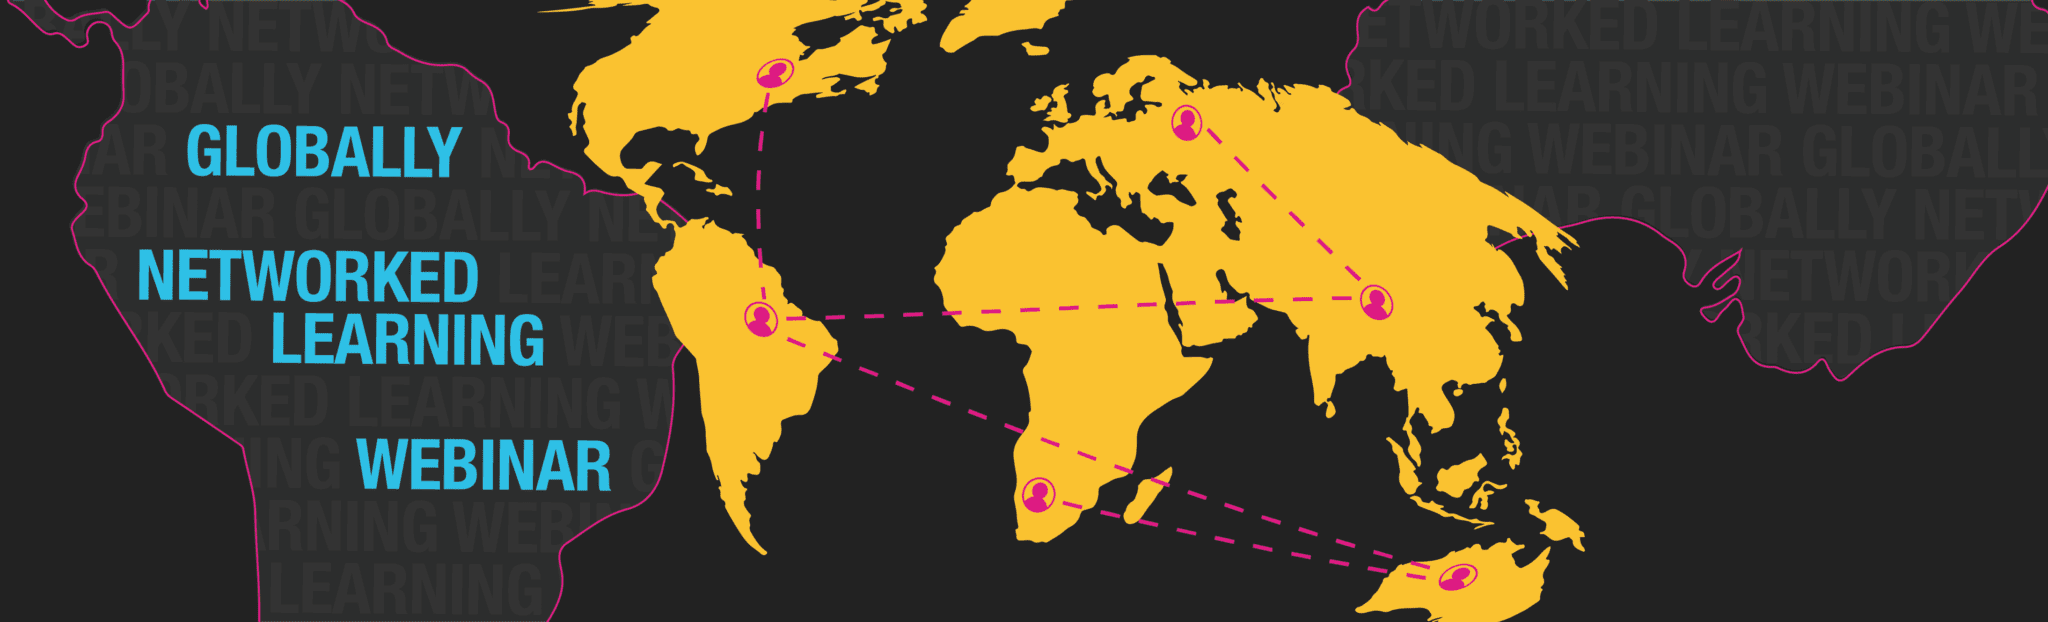 Globally Networked Learning Webinar feat. Virtual Journal Club